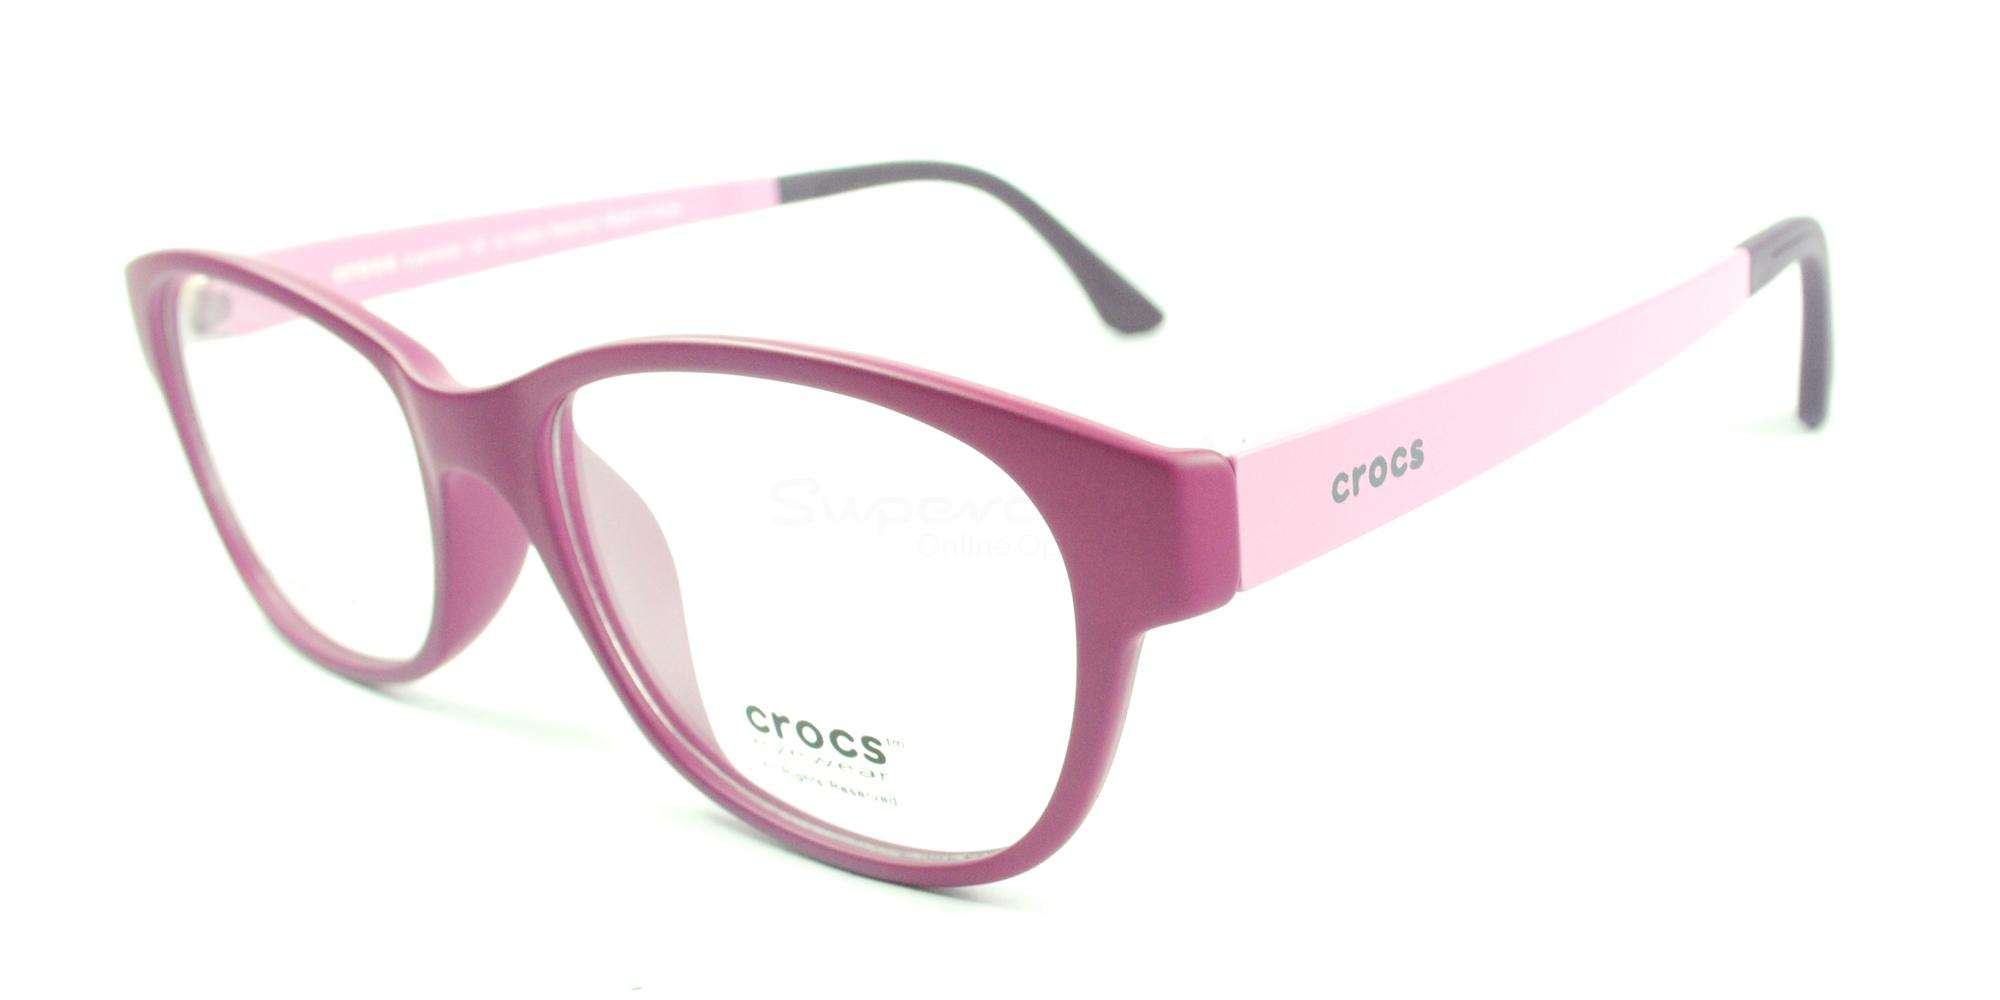 35VT CF621 Glasses, Crocs Eyewear